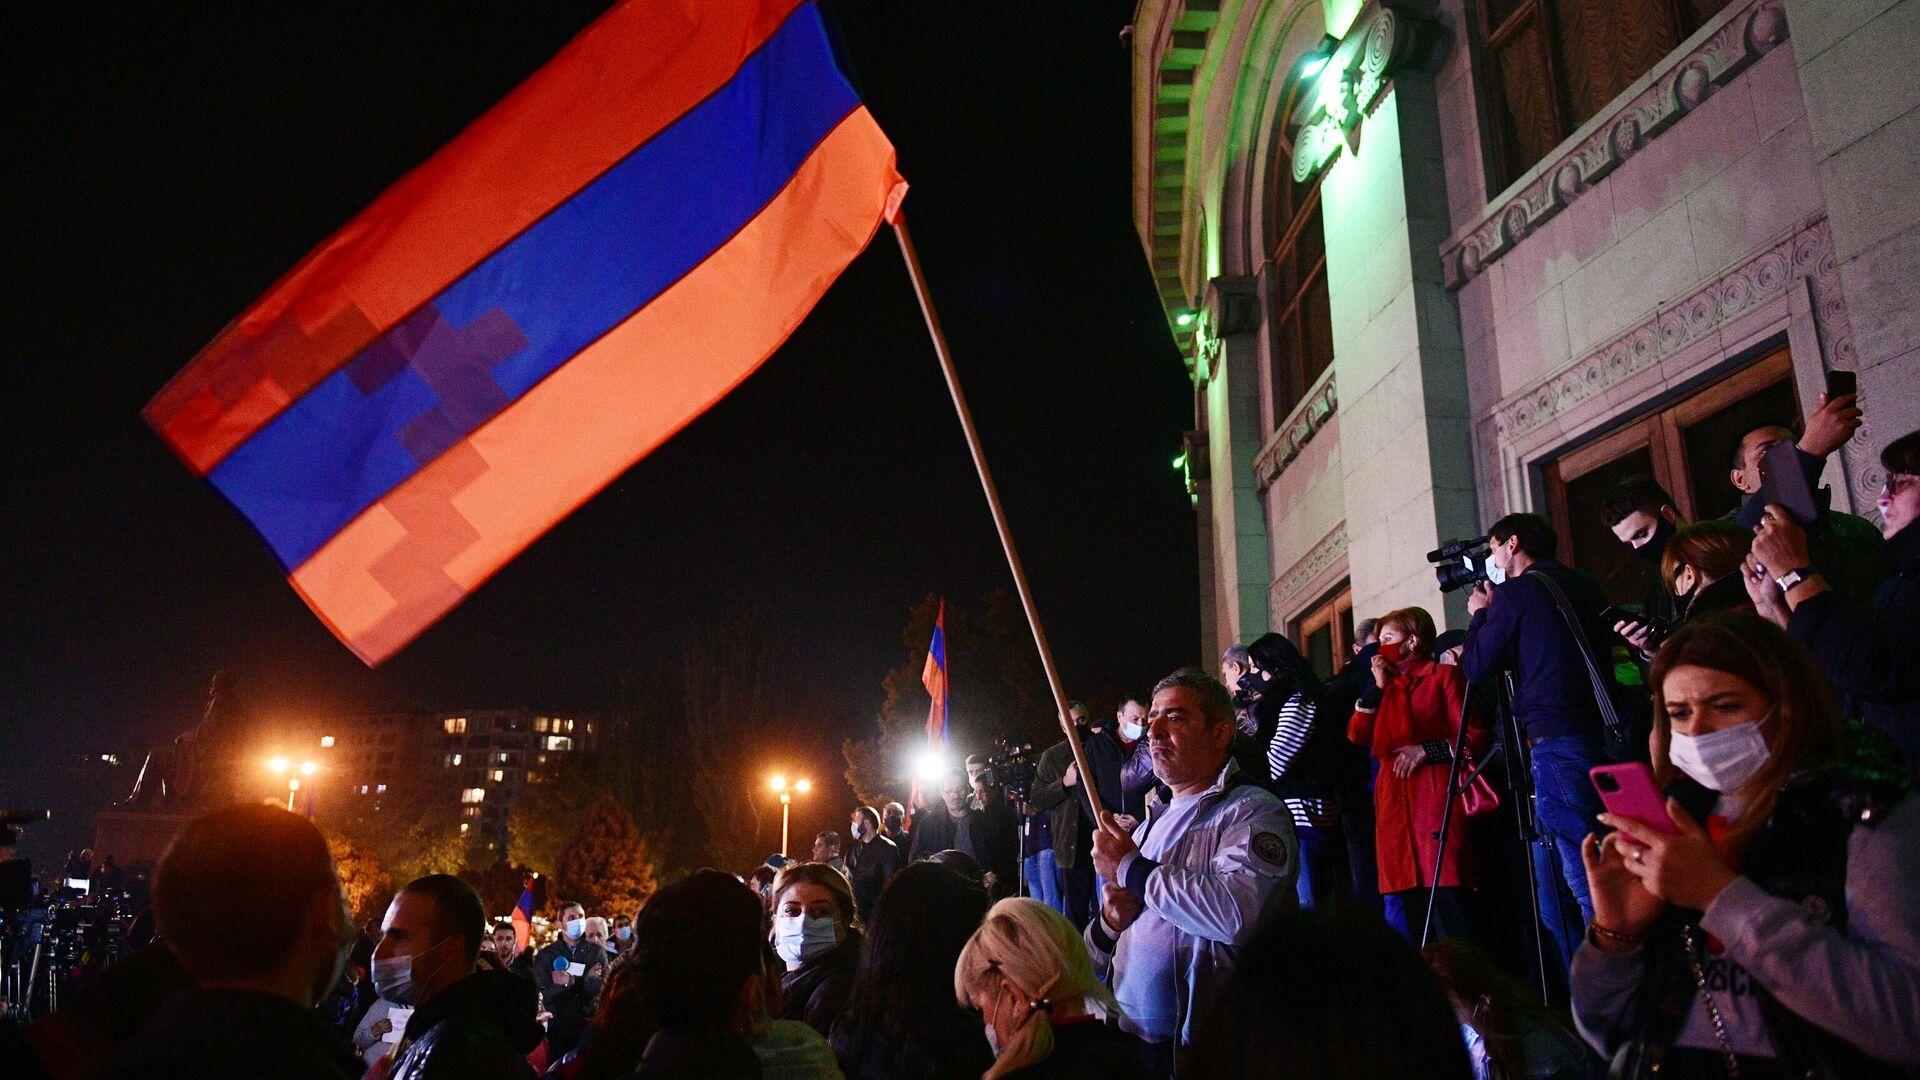 Участники митинга оппозиции в Ереване - РИА Новости, 1920, 12.11.2020